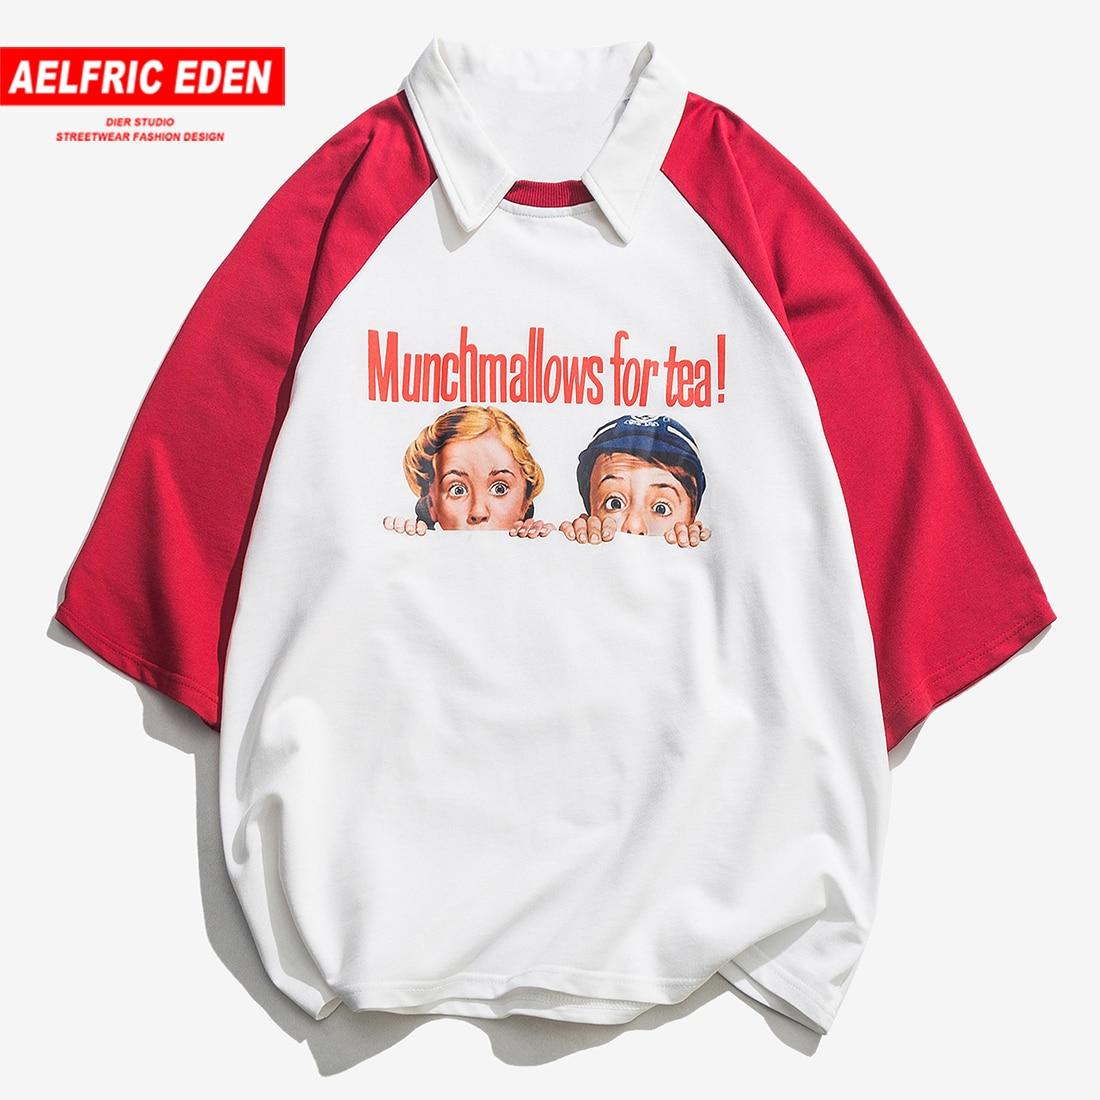 Aelfric Eden Fake Two Pieces Funny Pattern Printed Casual Hip Hop Mens T-shirts 2019 Summer Fashion Harajuku T-shirts Streetwear